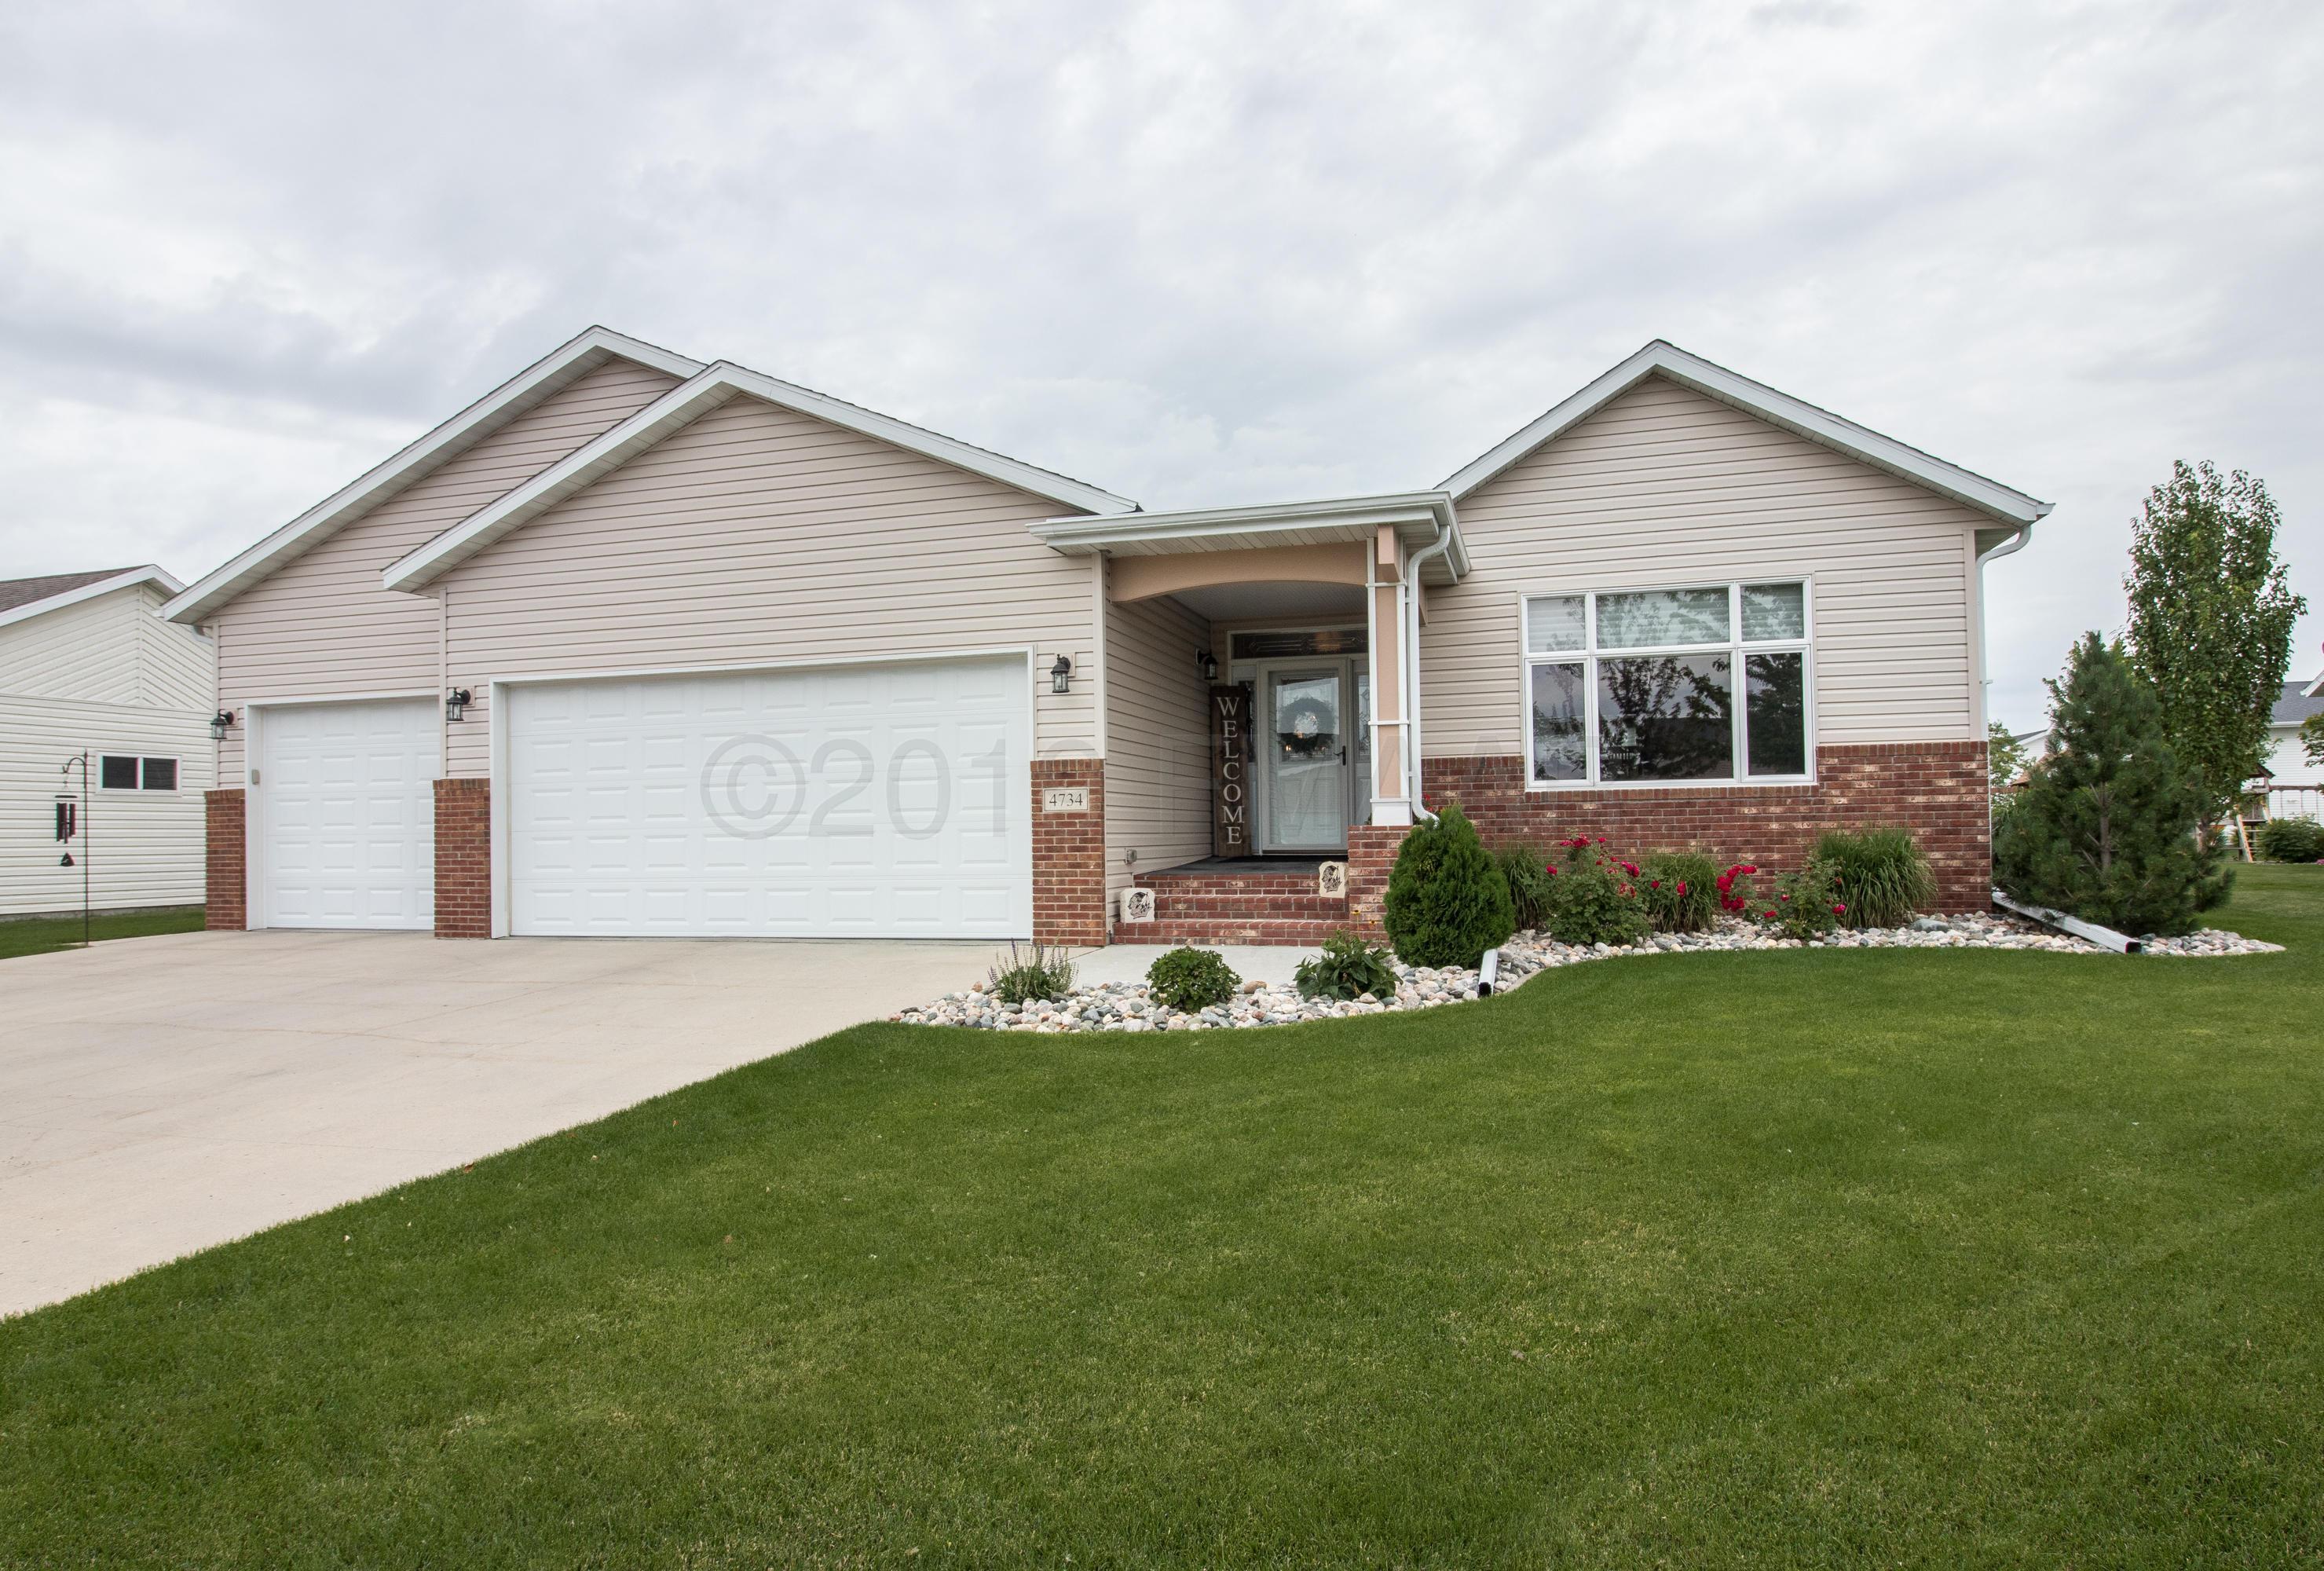 4734 ARBOR Court S, Fargo, ND 58104